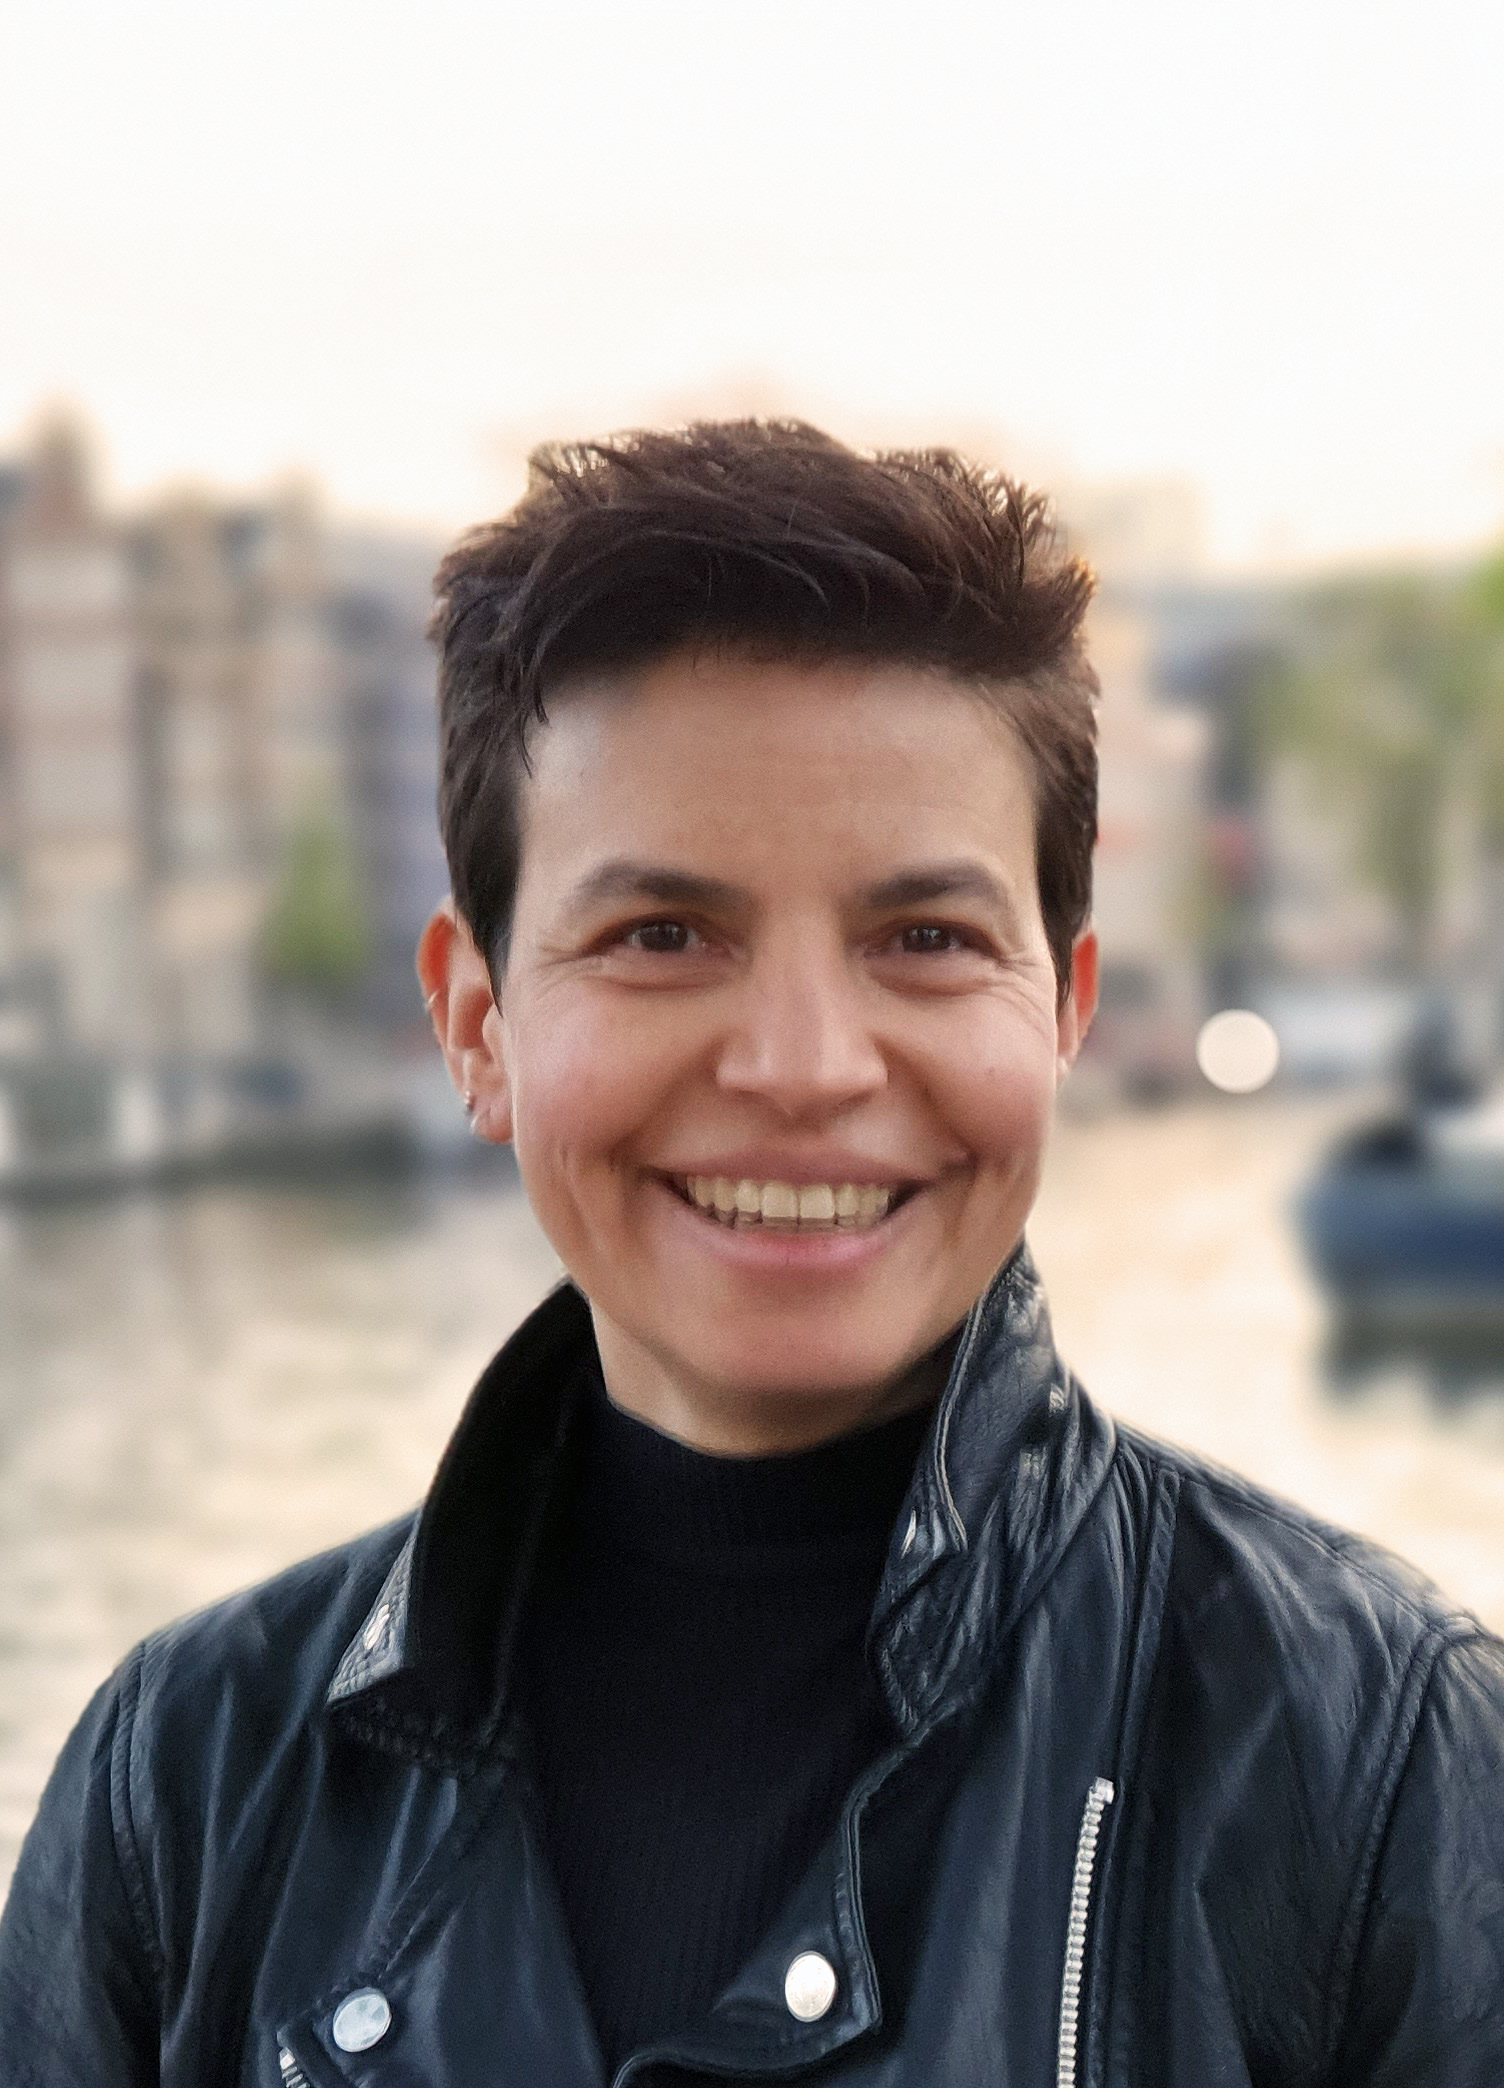 Markha Valenta, President : Assistant Professor of Politics/ Culture/ History, University College Utrecht